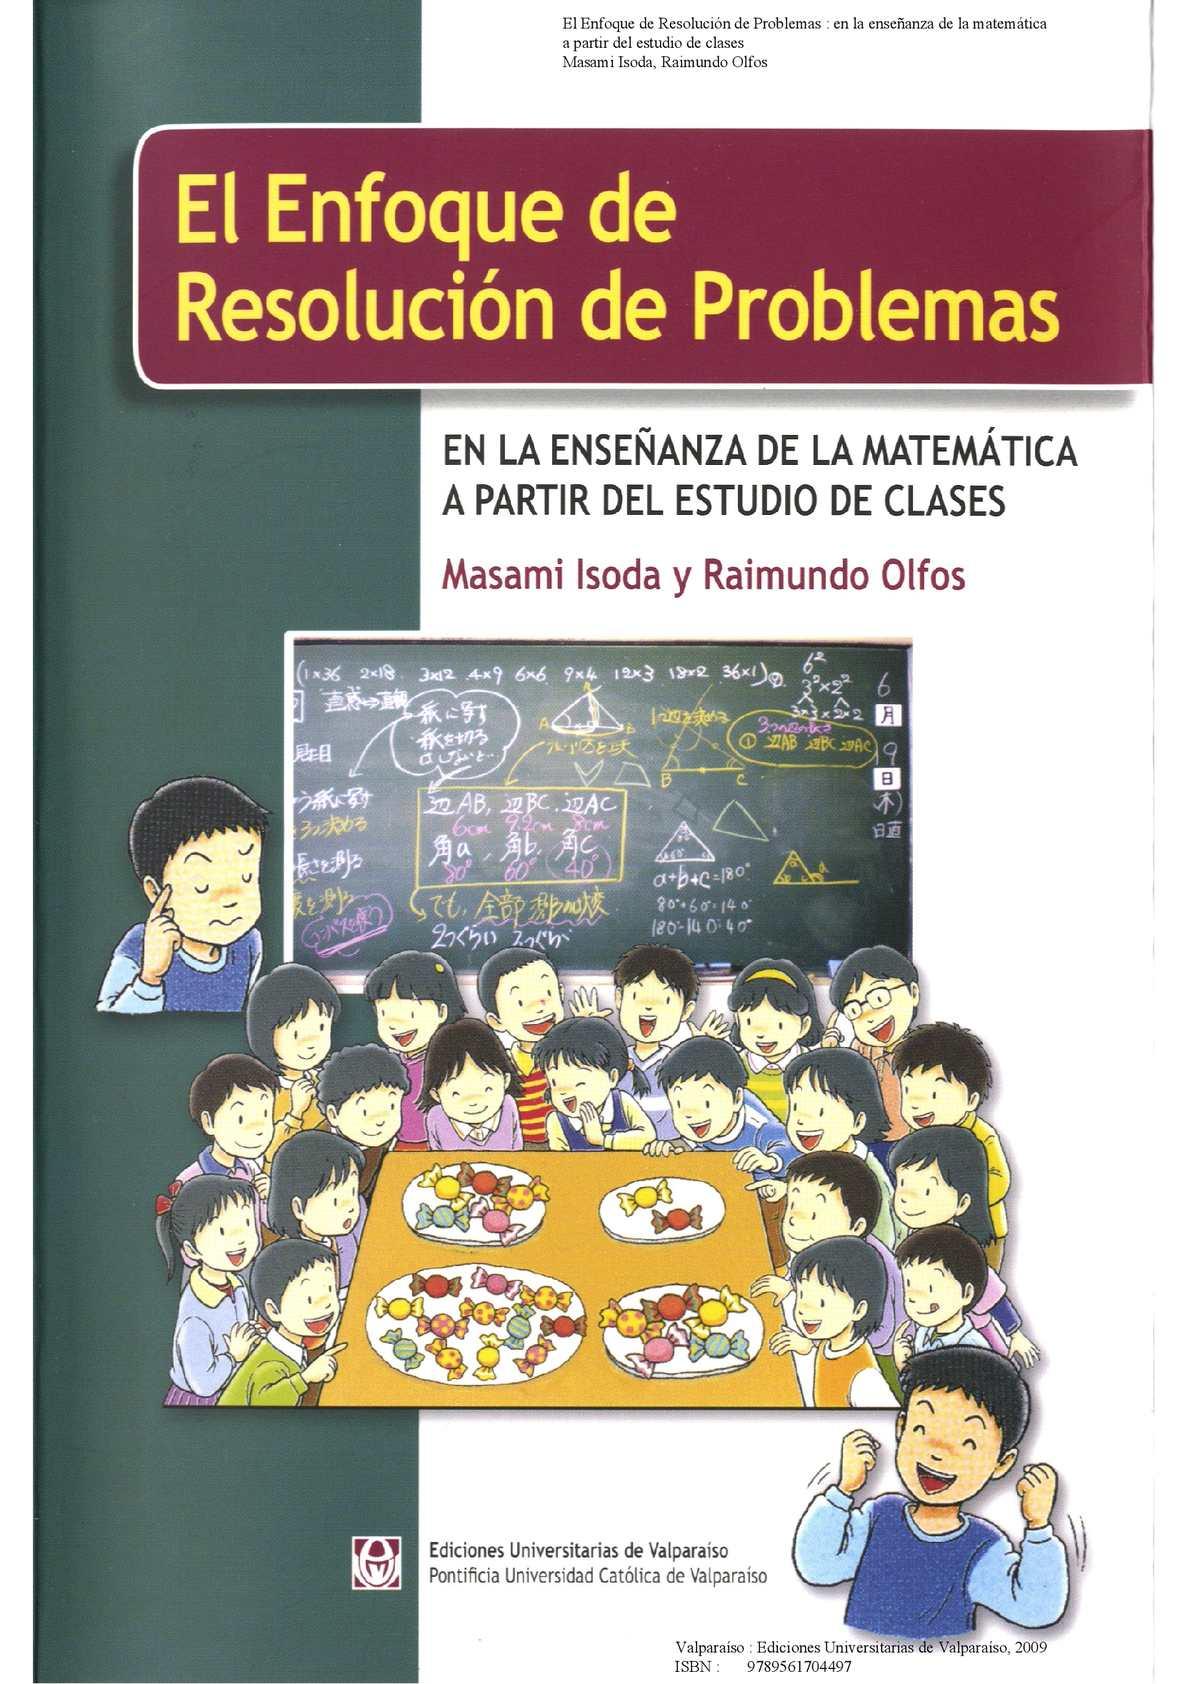 ProblemSolvingIsodaOlfos-Isoda (2)